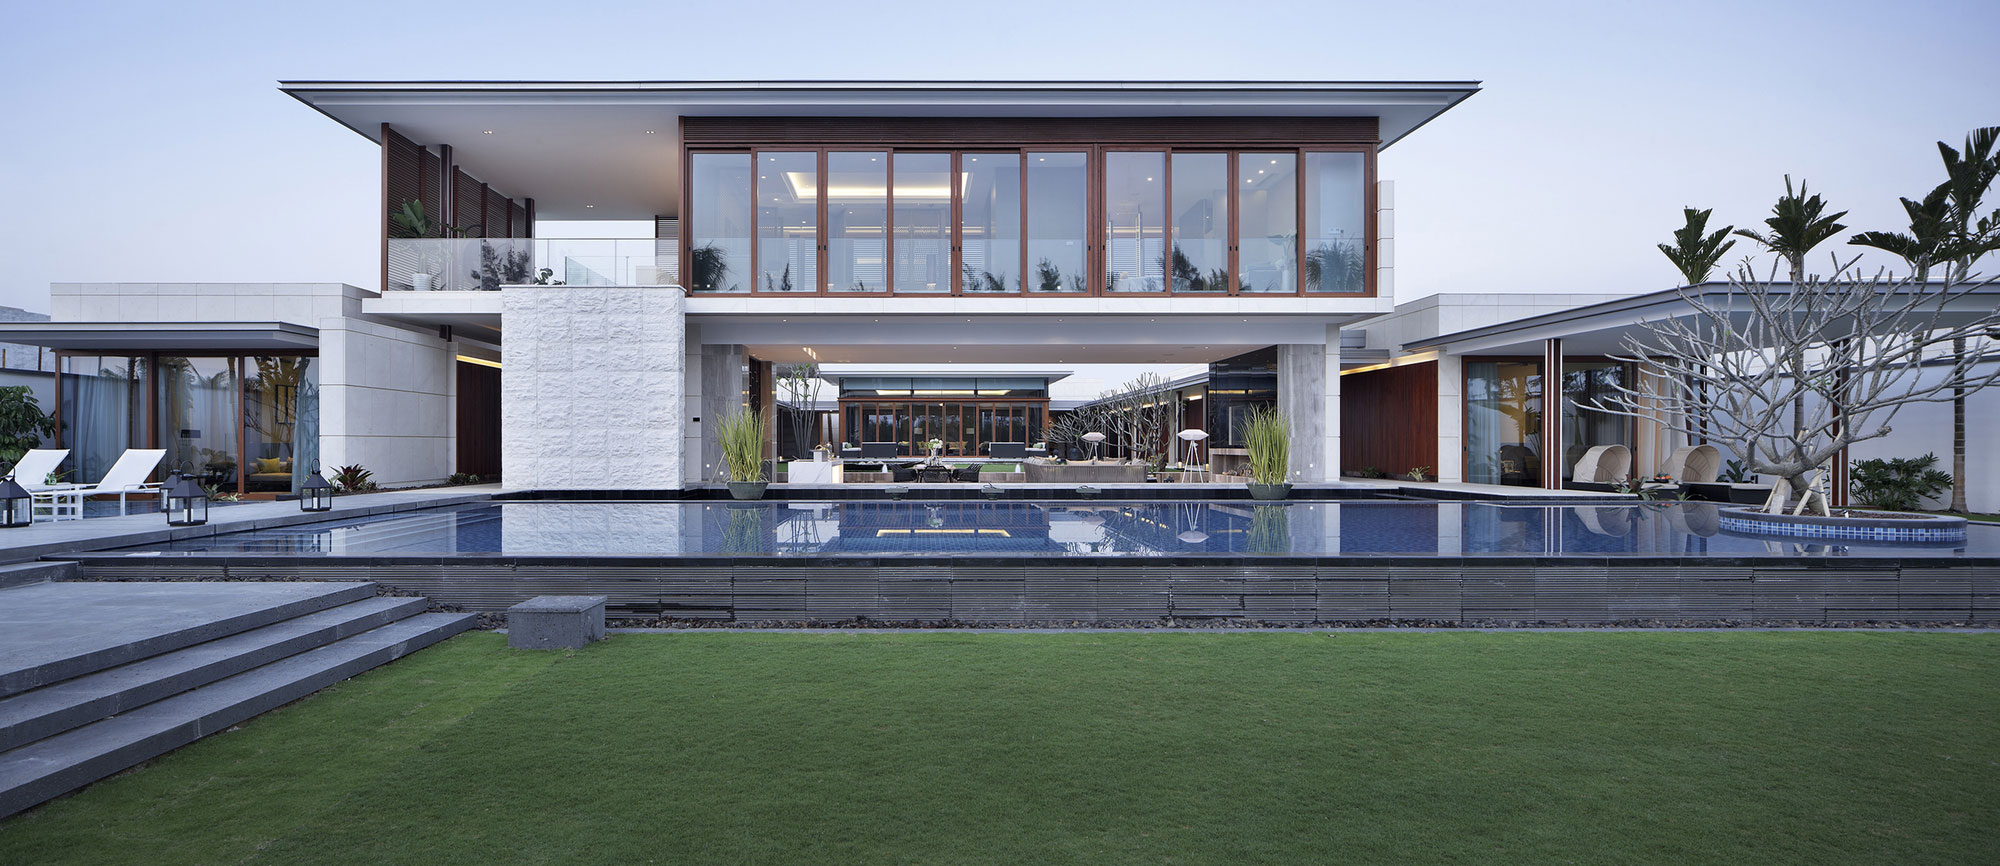 Large Pool, Lawn, Beachside Villas in Lingshui, Hainan, China